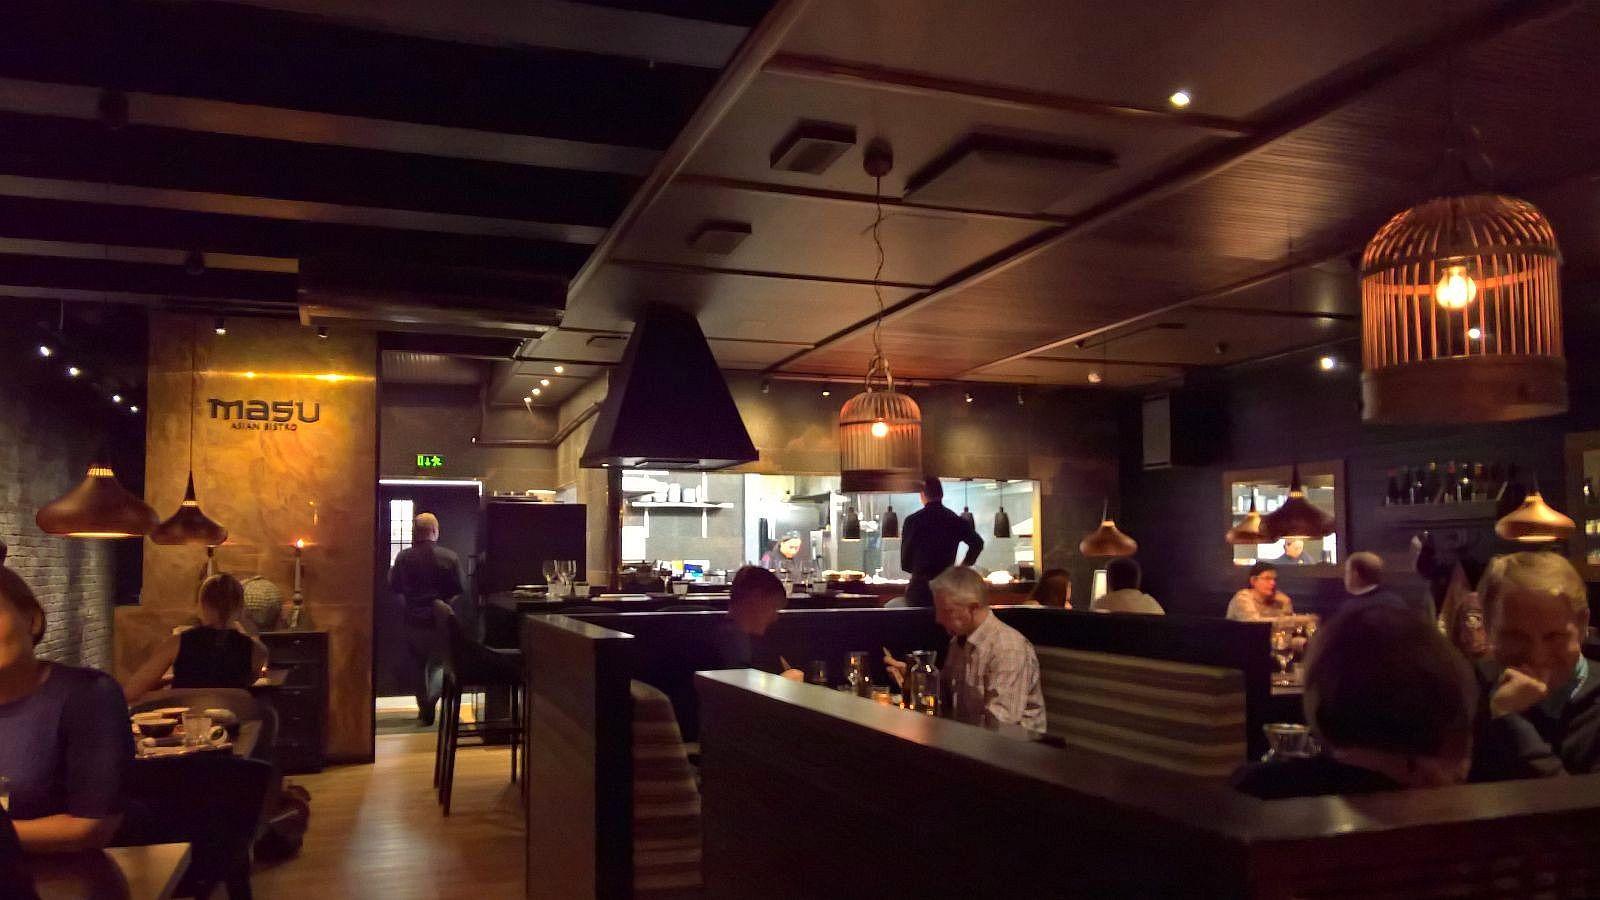 Masu Asian Bistro Tampere mallaspulla ravintola-arvio